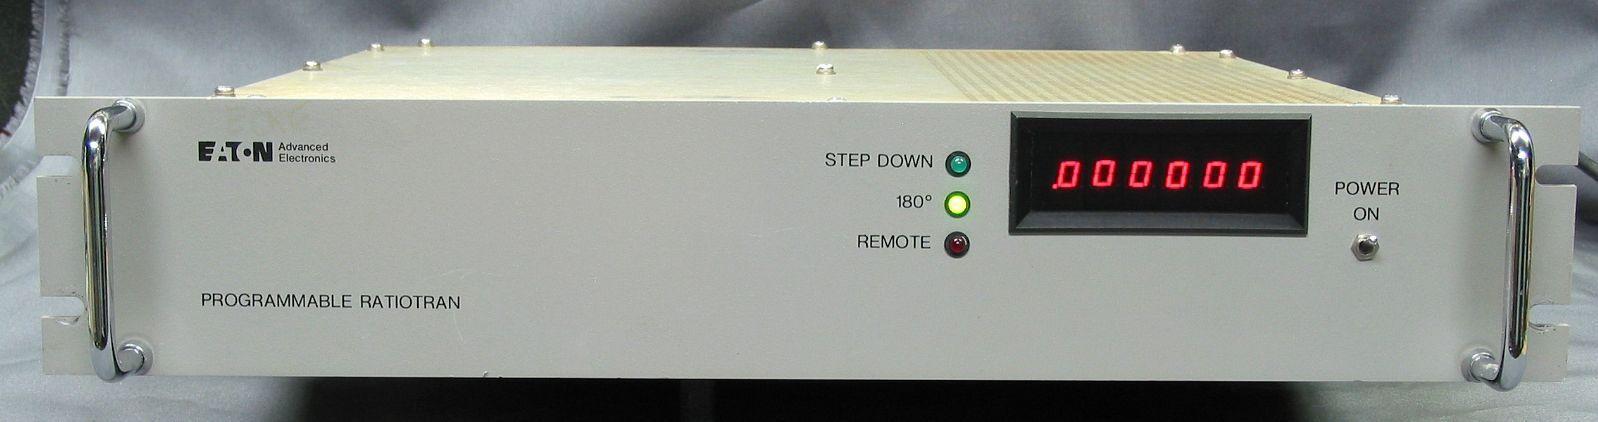 Eaton (Tegam) PRT-10C Programmable Ratio Transformer GPIB RatioTran